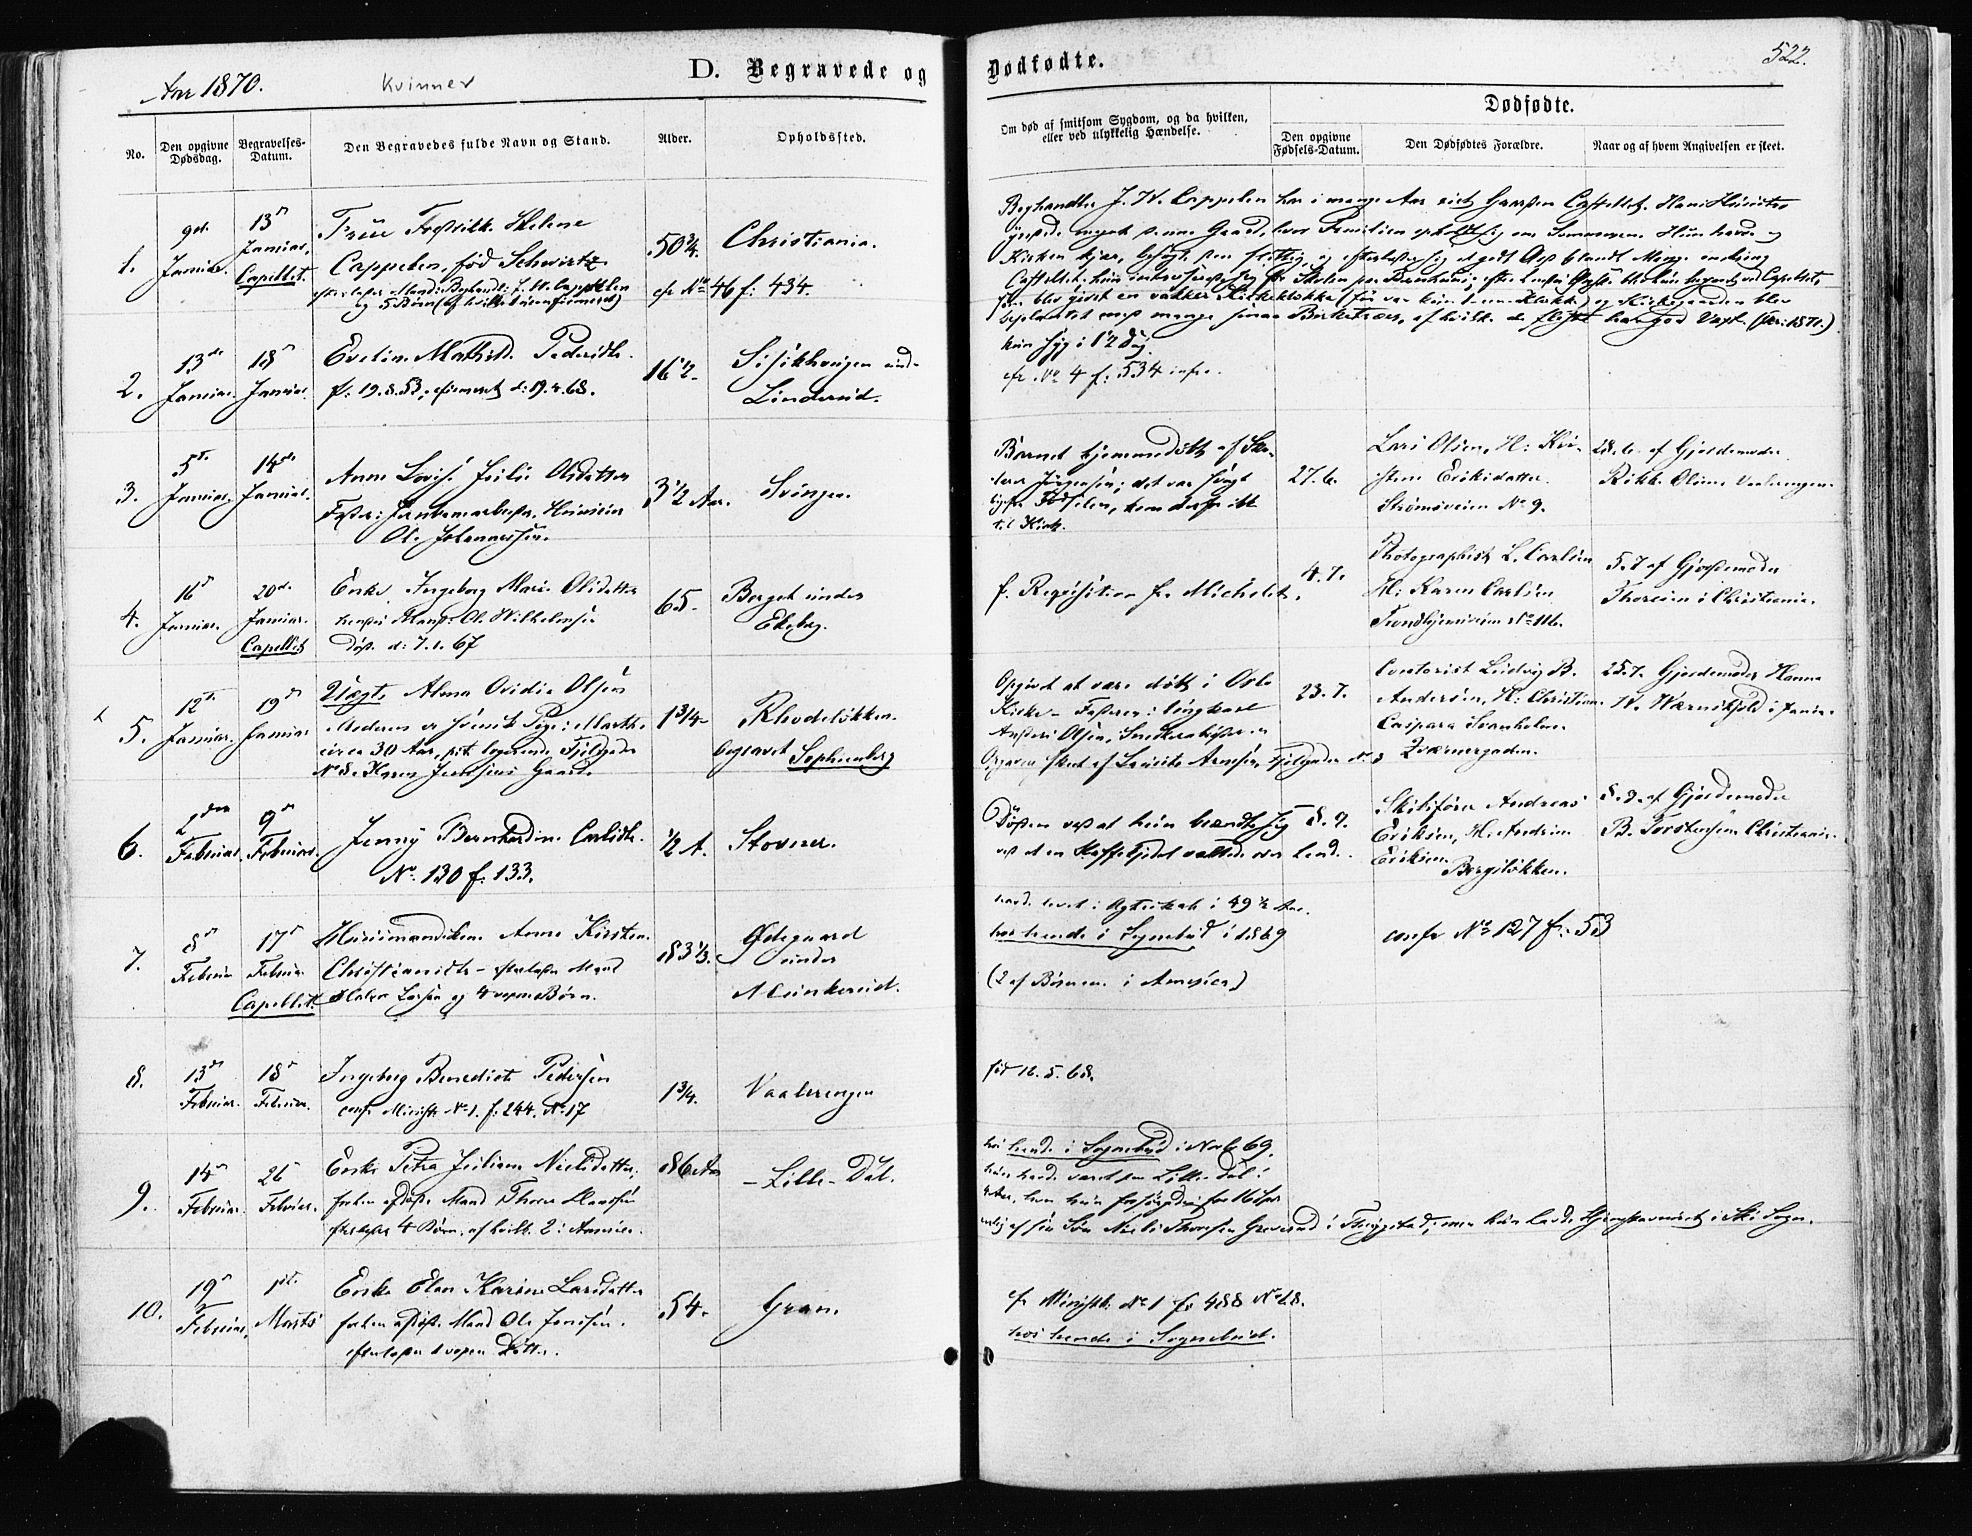 SAO, Østre Aker prestekontor Kirkebøker, F/Fa/L0003: Ministerialbok nr. I 3, 1869-1875, s. 522